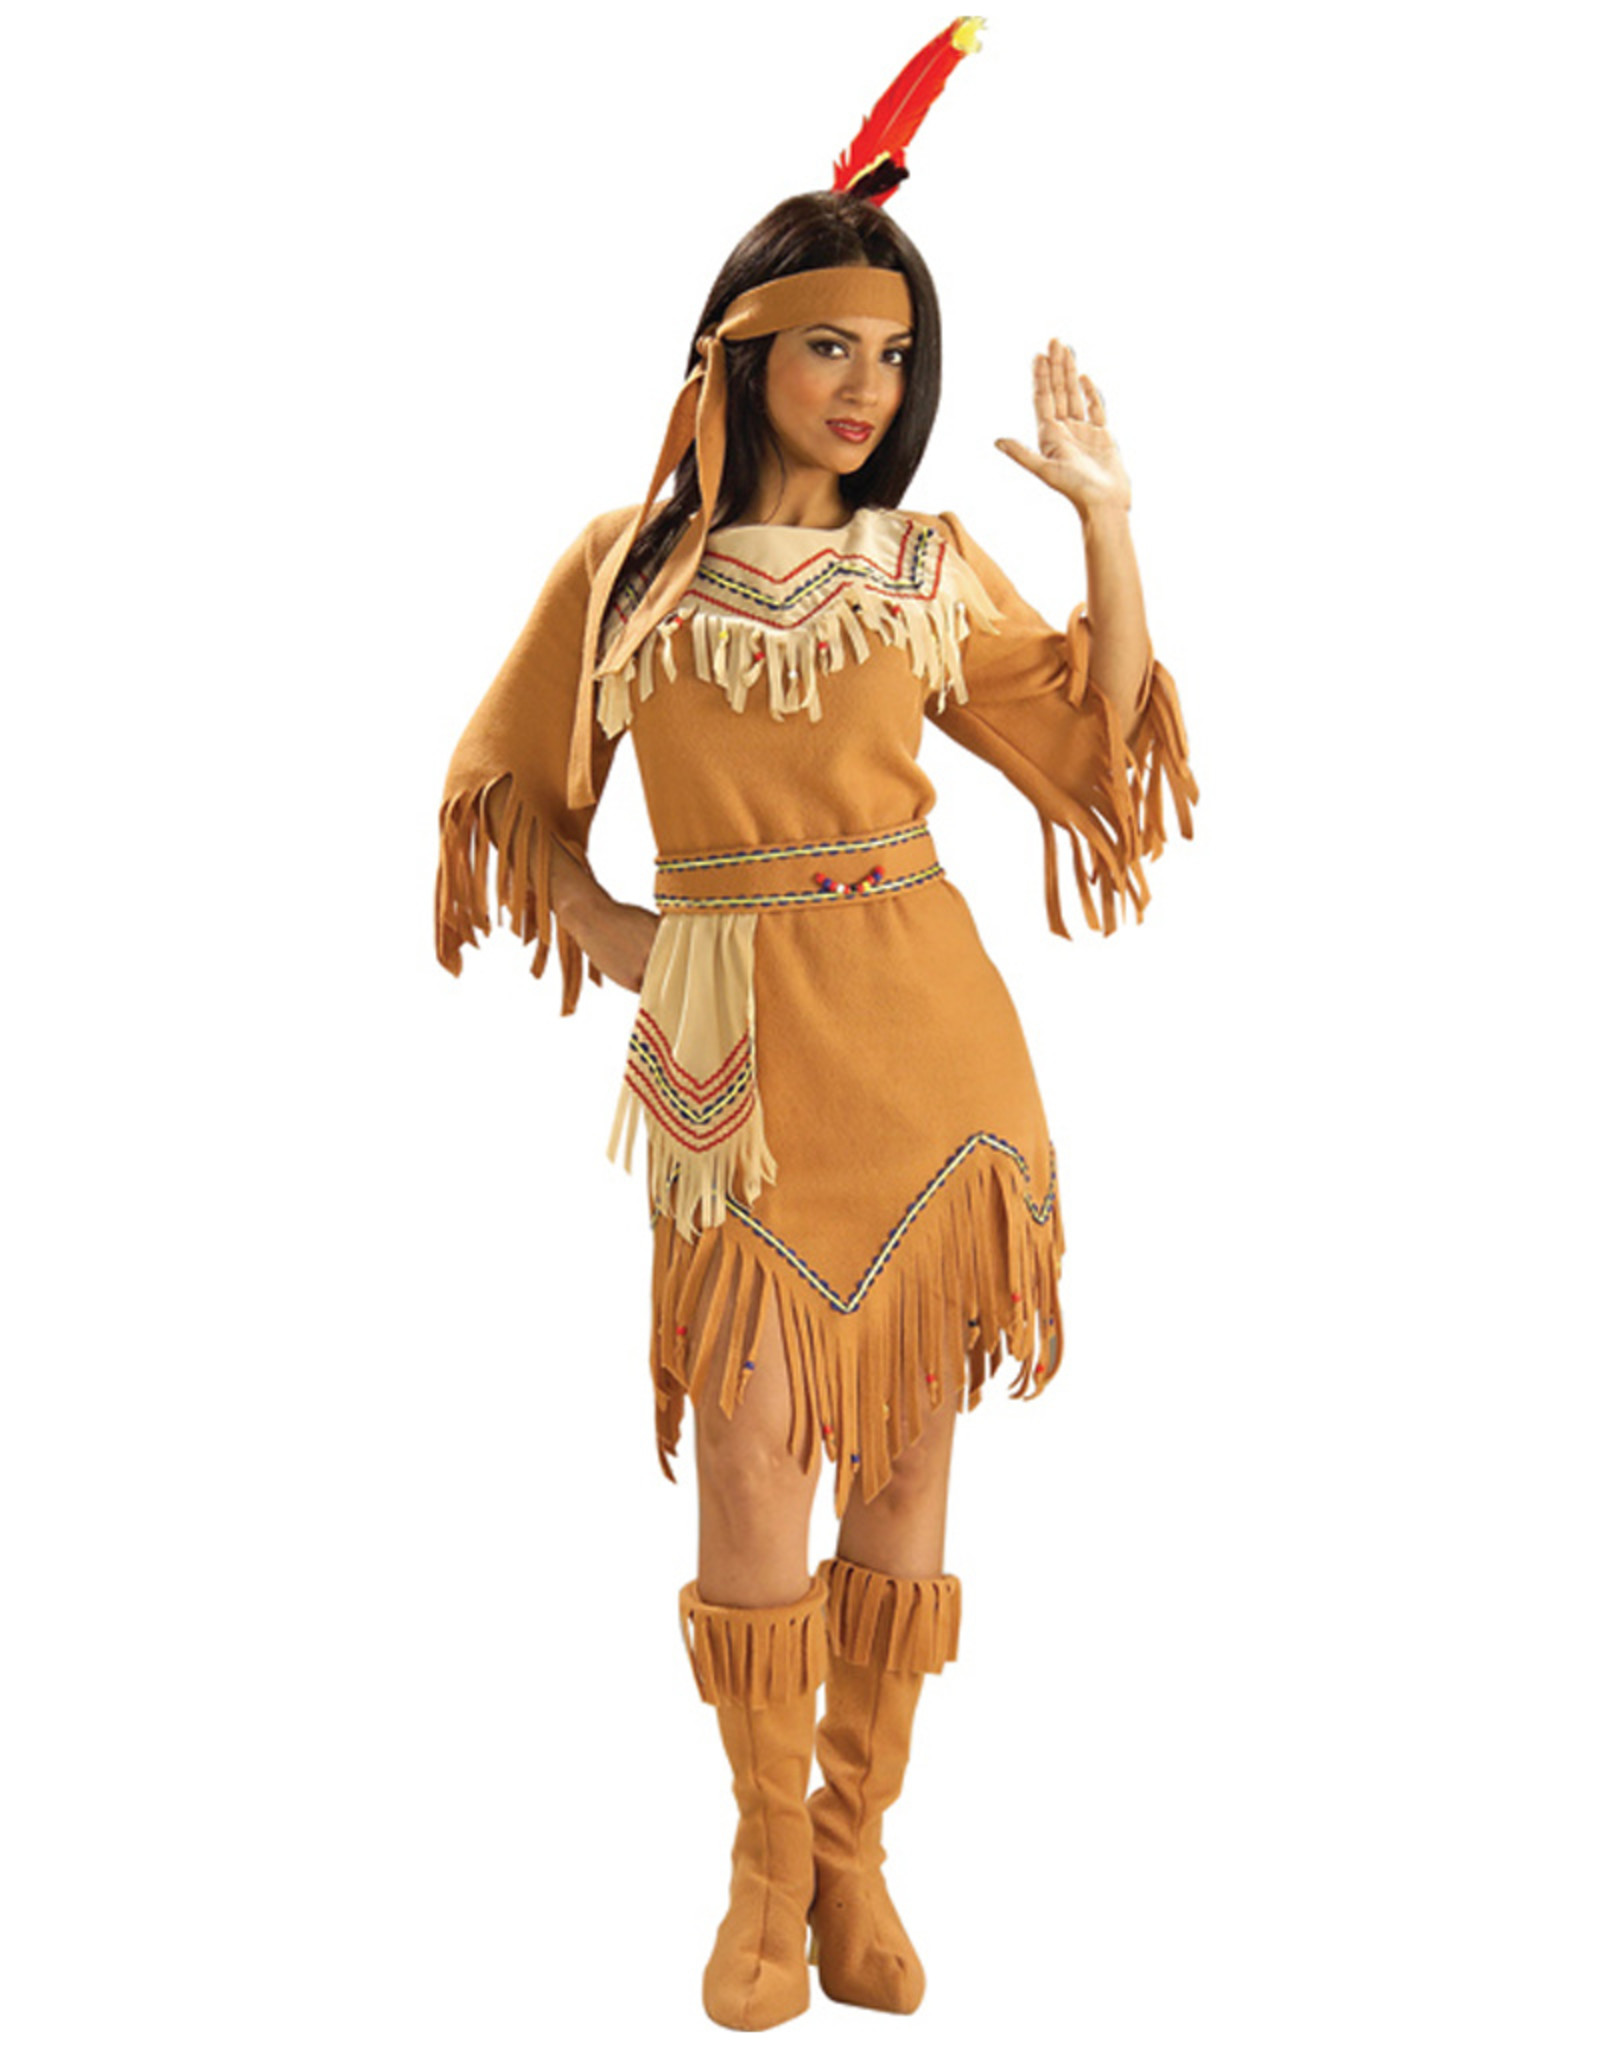 Native American Maiden Costume - Women's